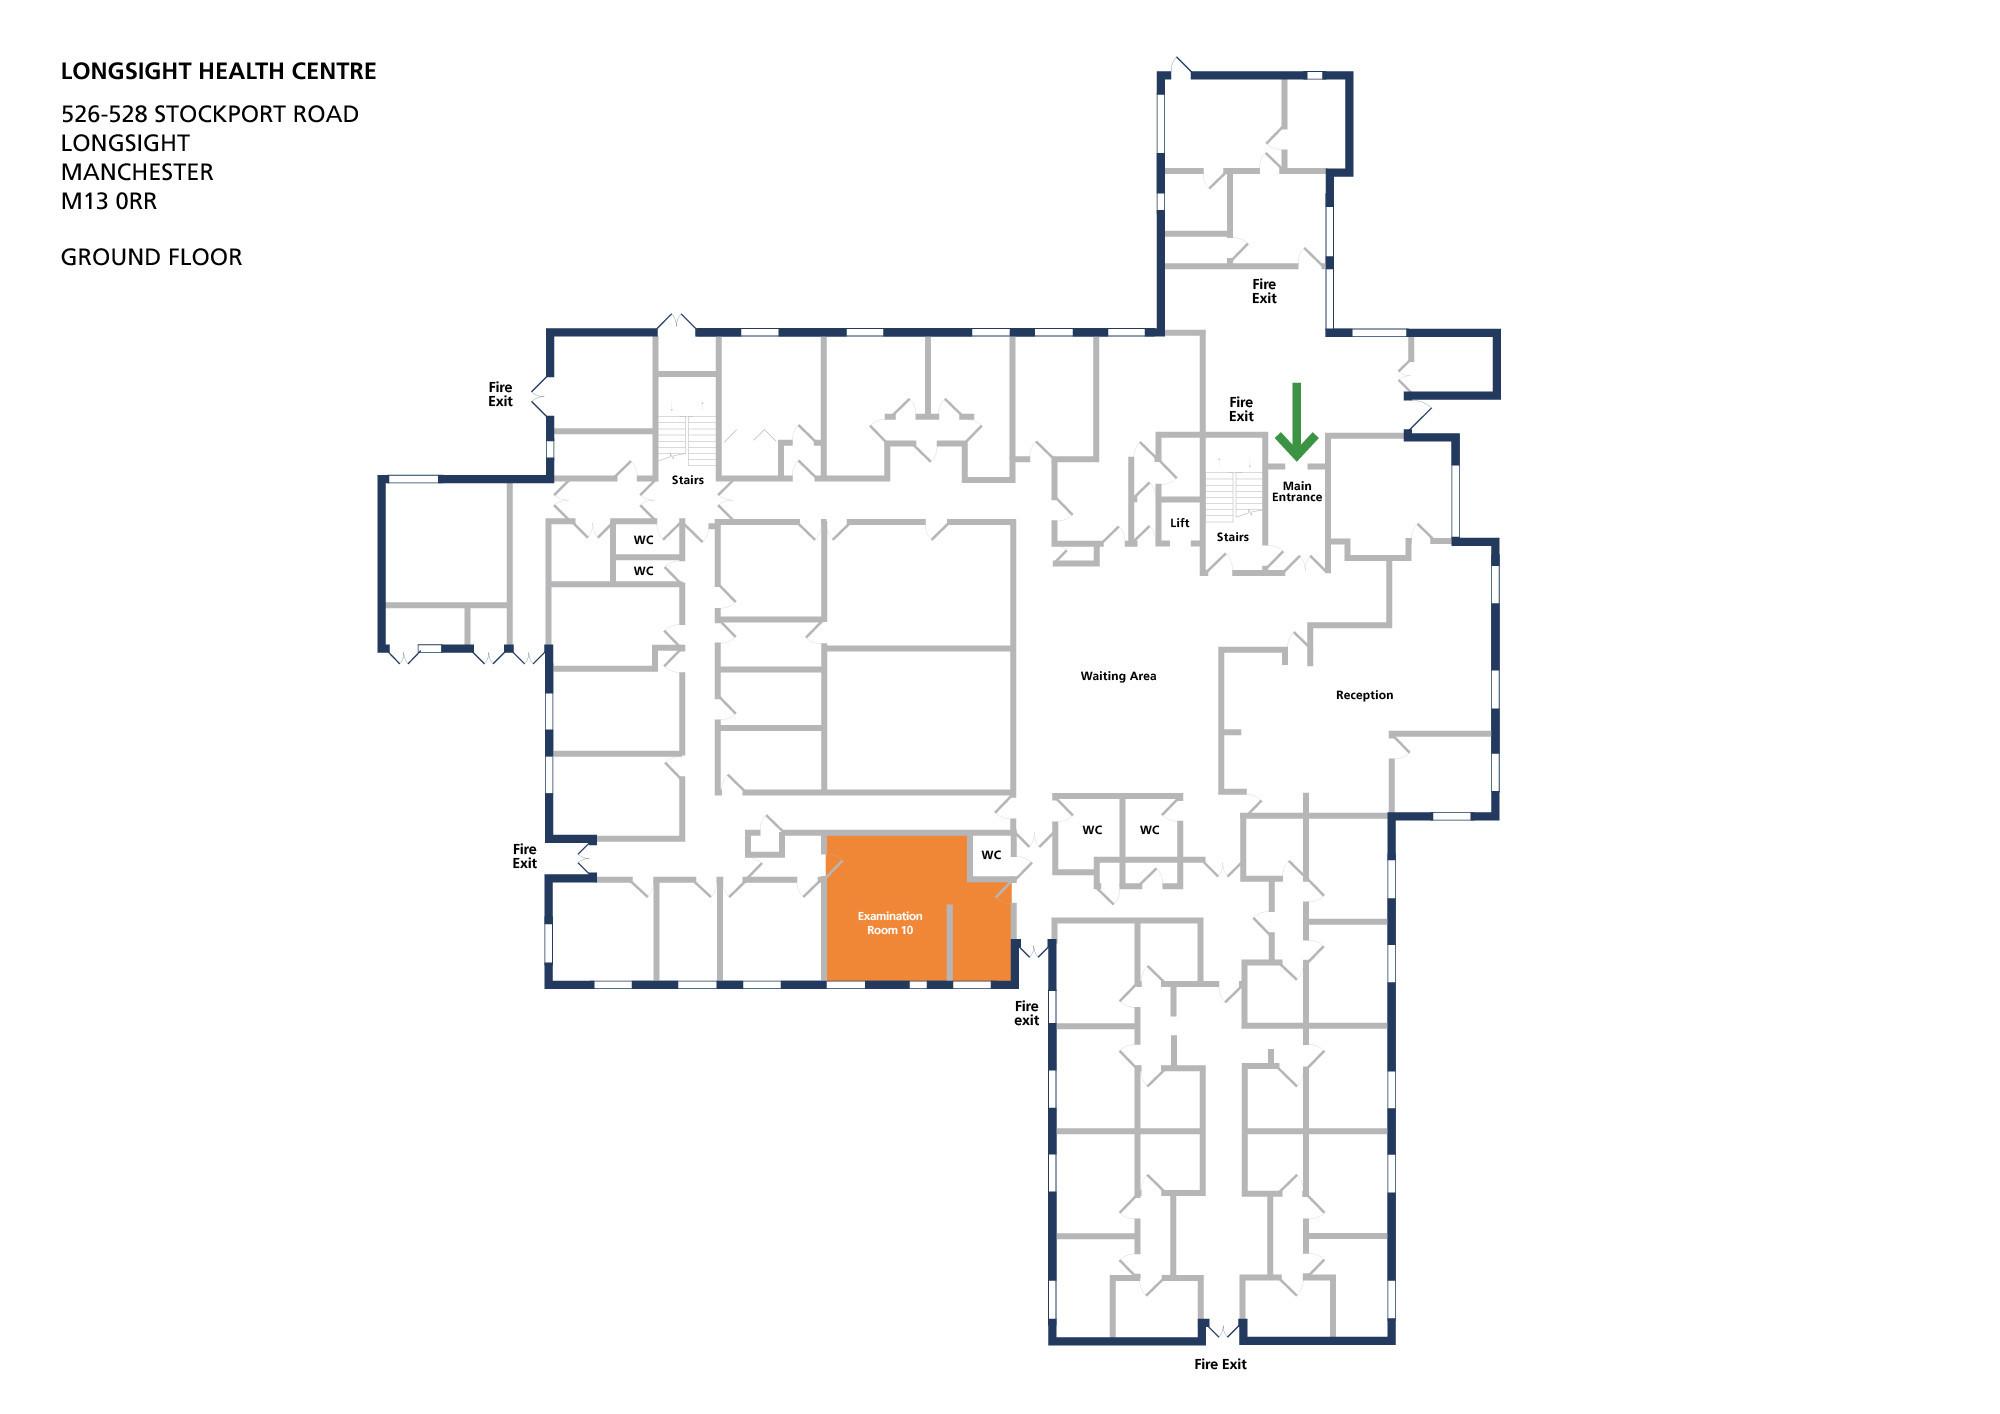 Longsight health centre room examination room 10 v1